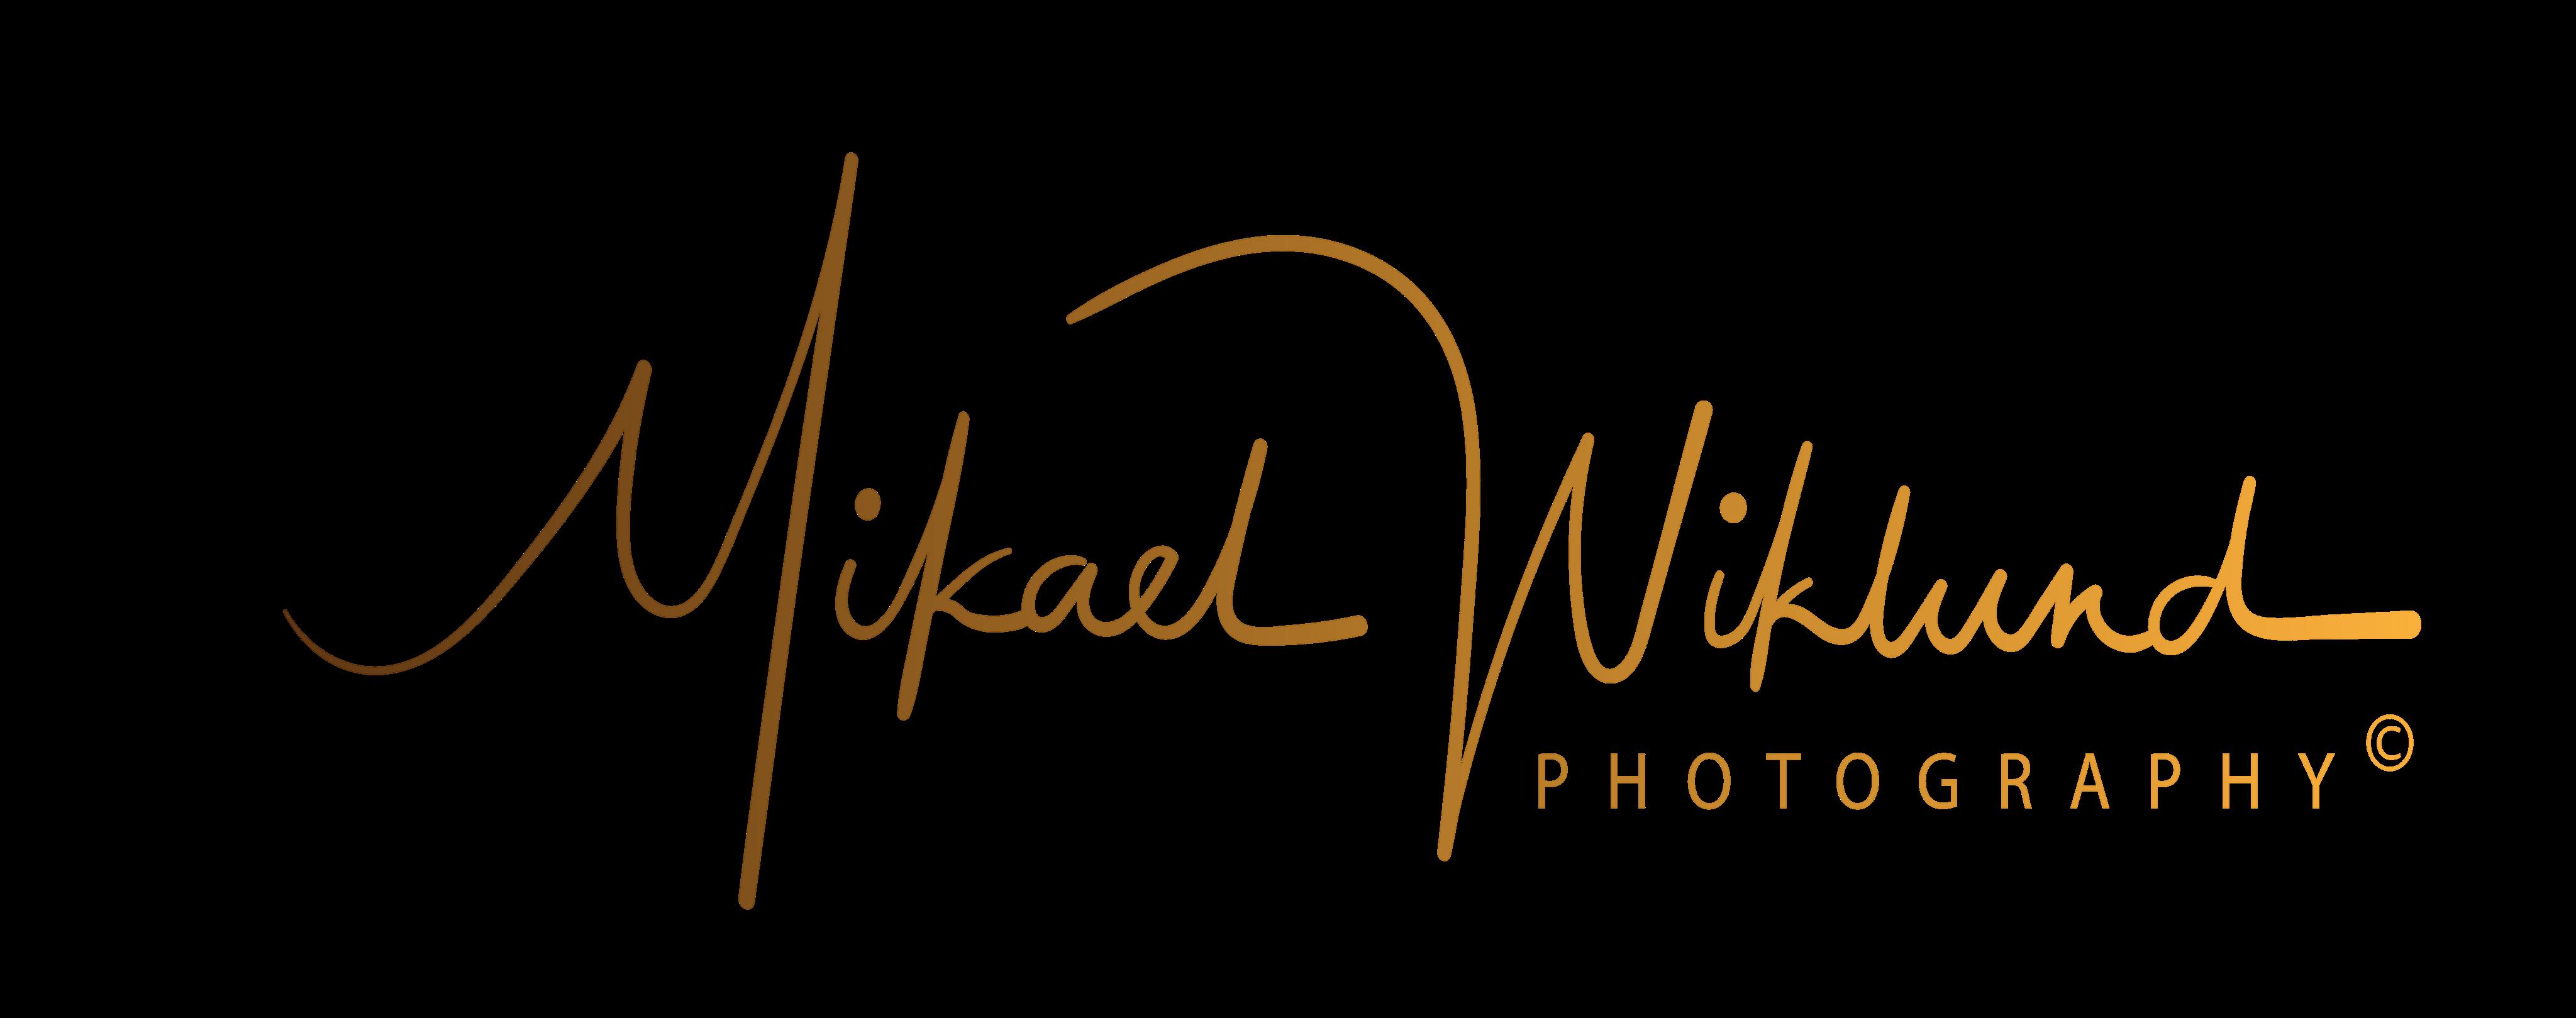 Mikael Wiklund